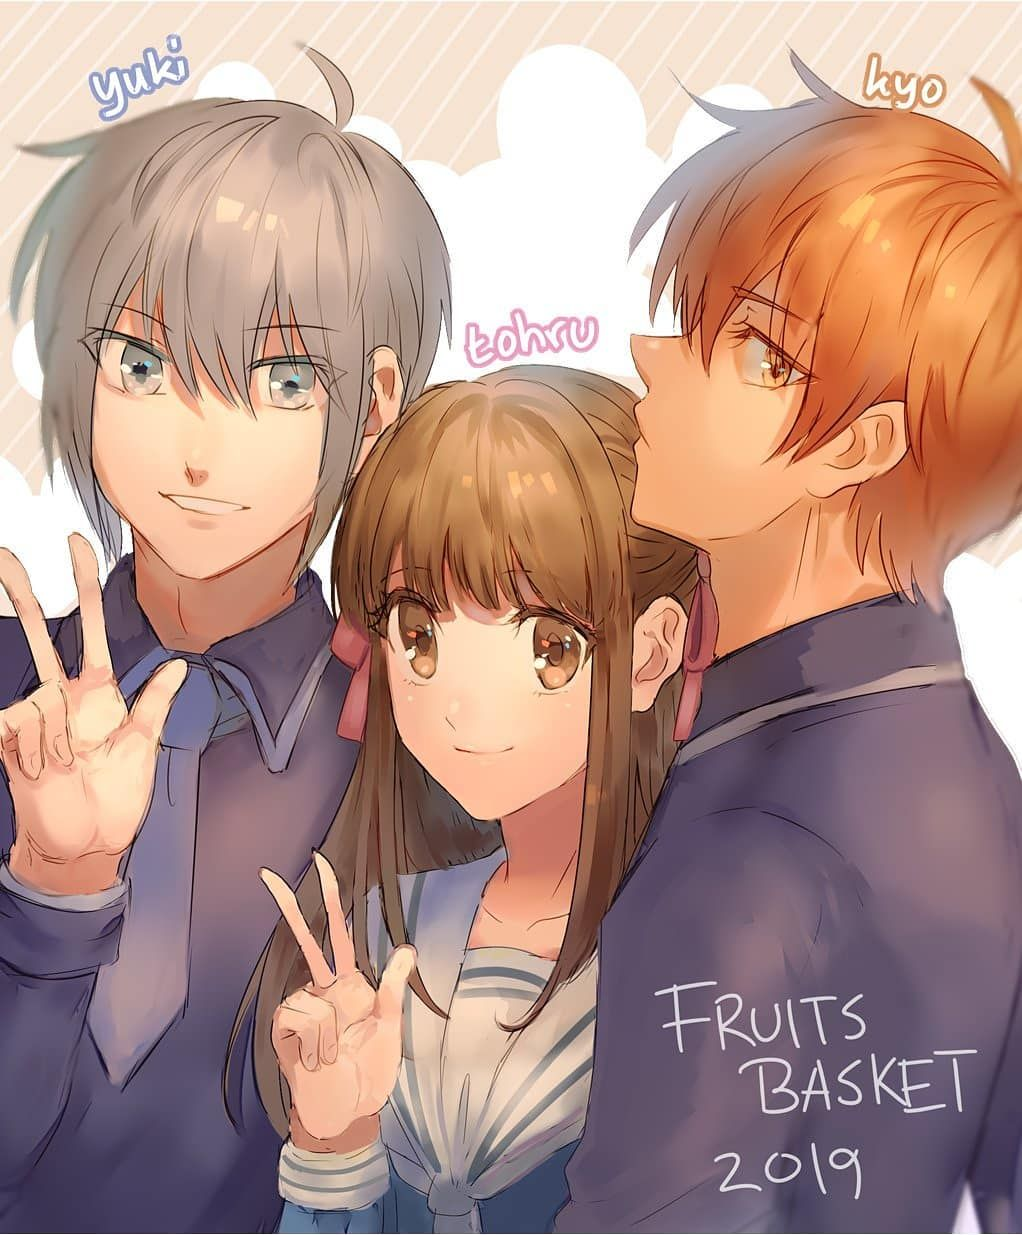 Fruits Basket fruitsbasket fruitsbasket2019 saharaujom